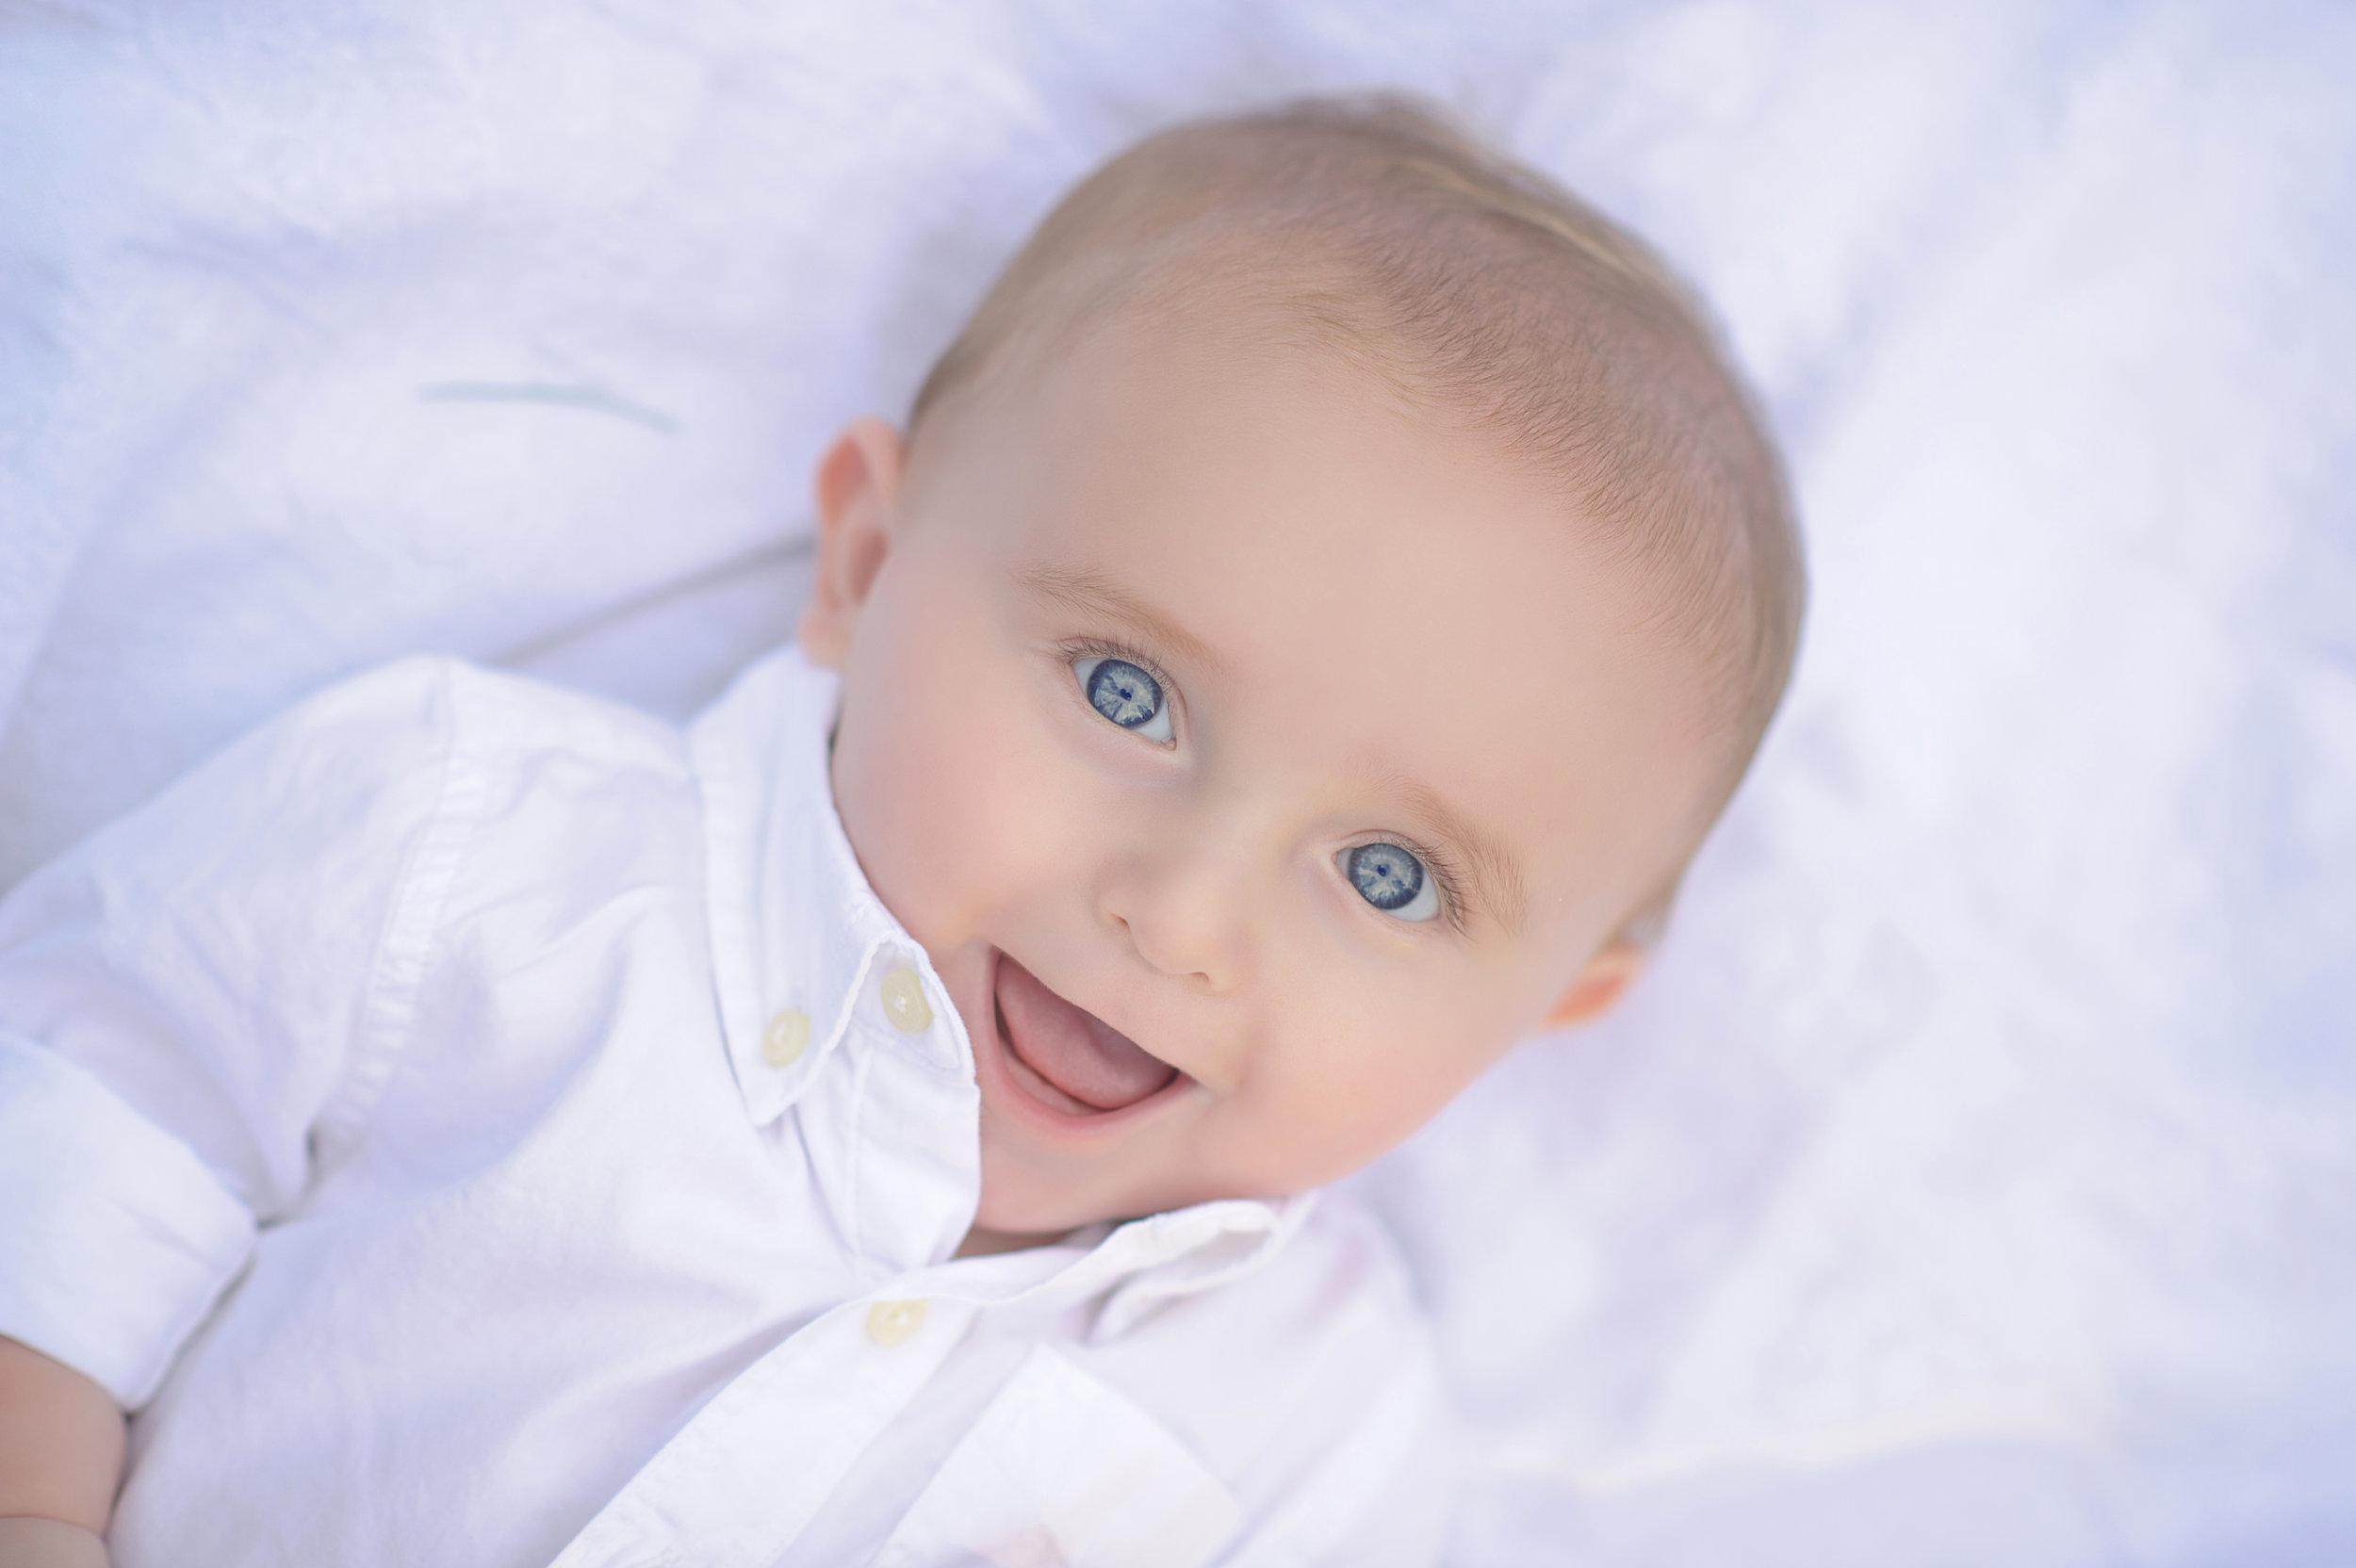 Chicago+Baby+Photographer+6+months-1.jpg